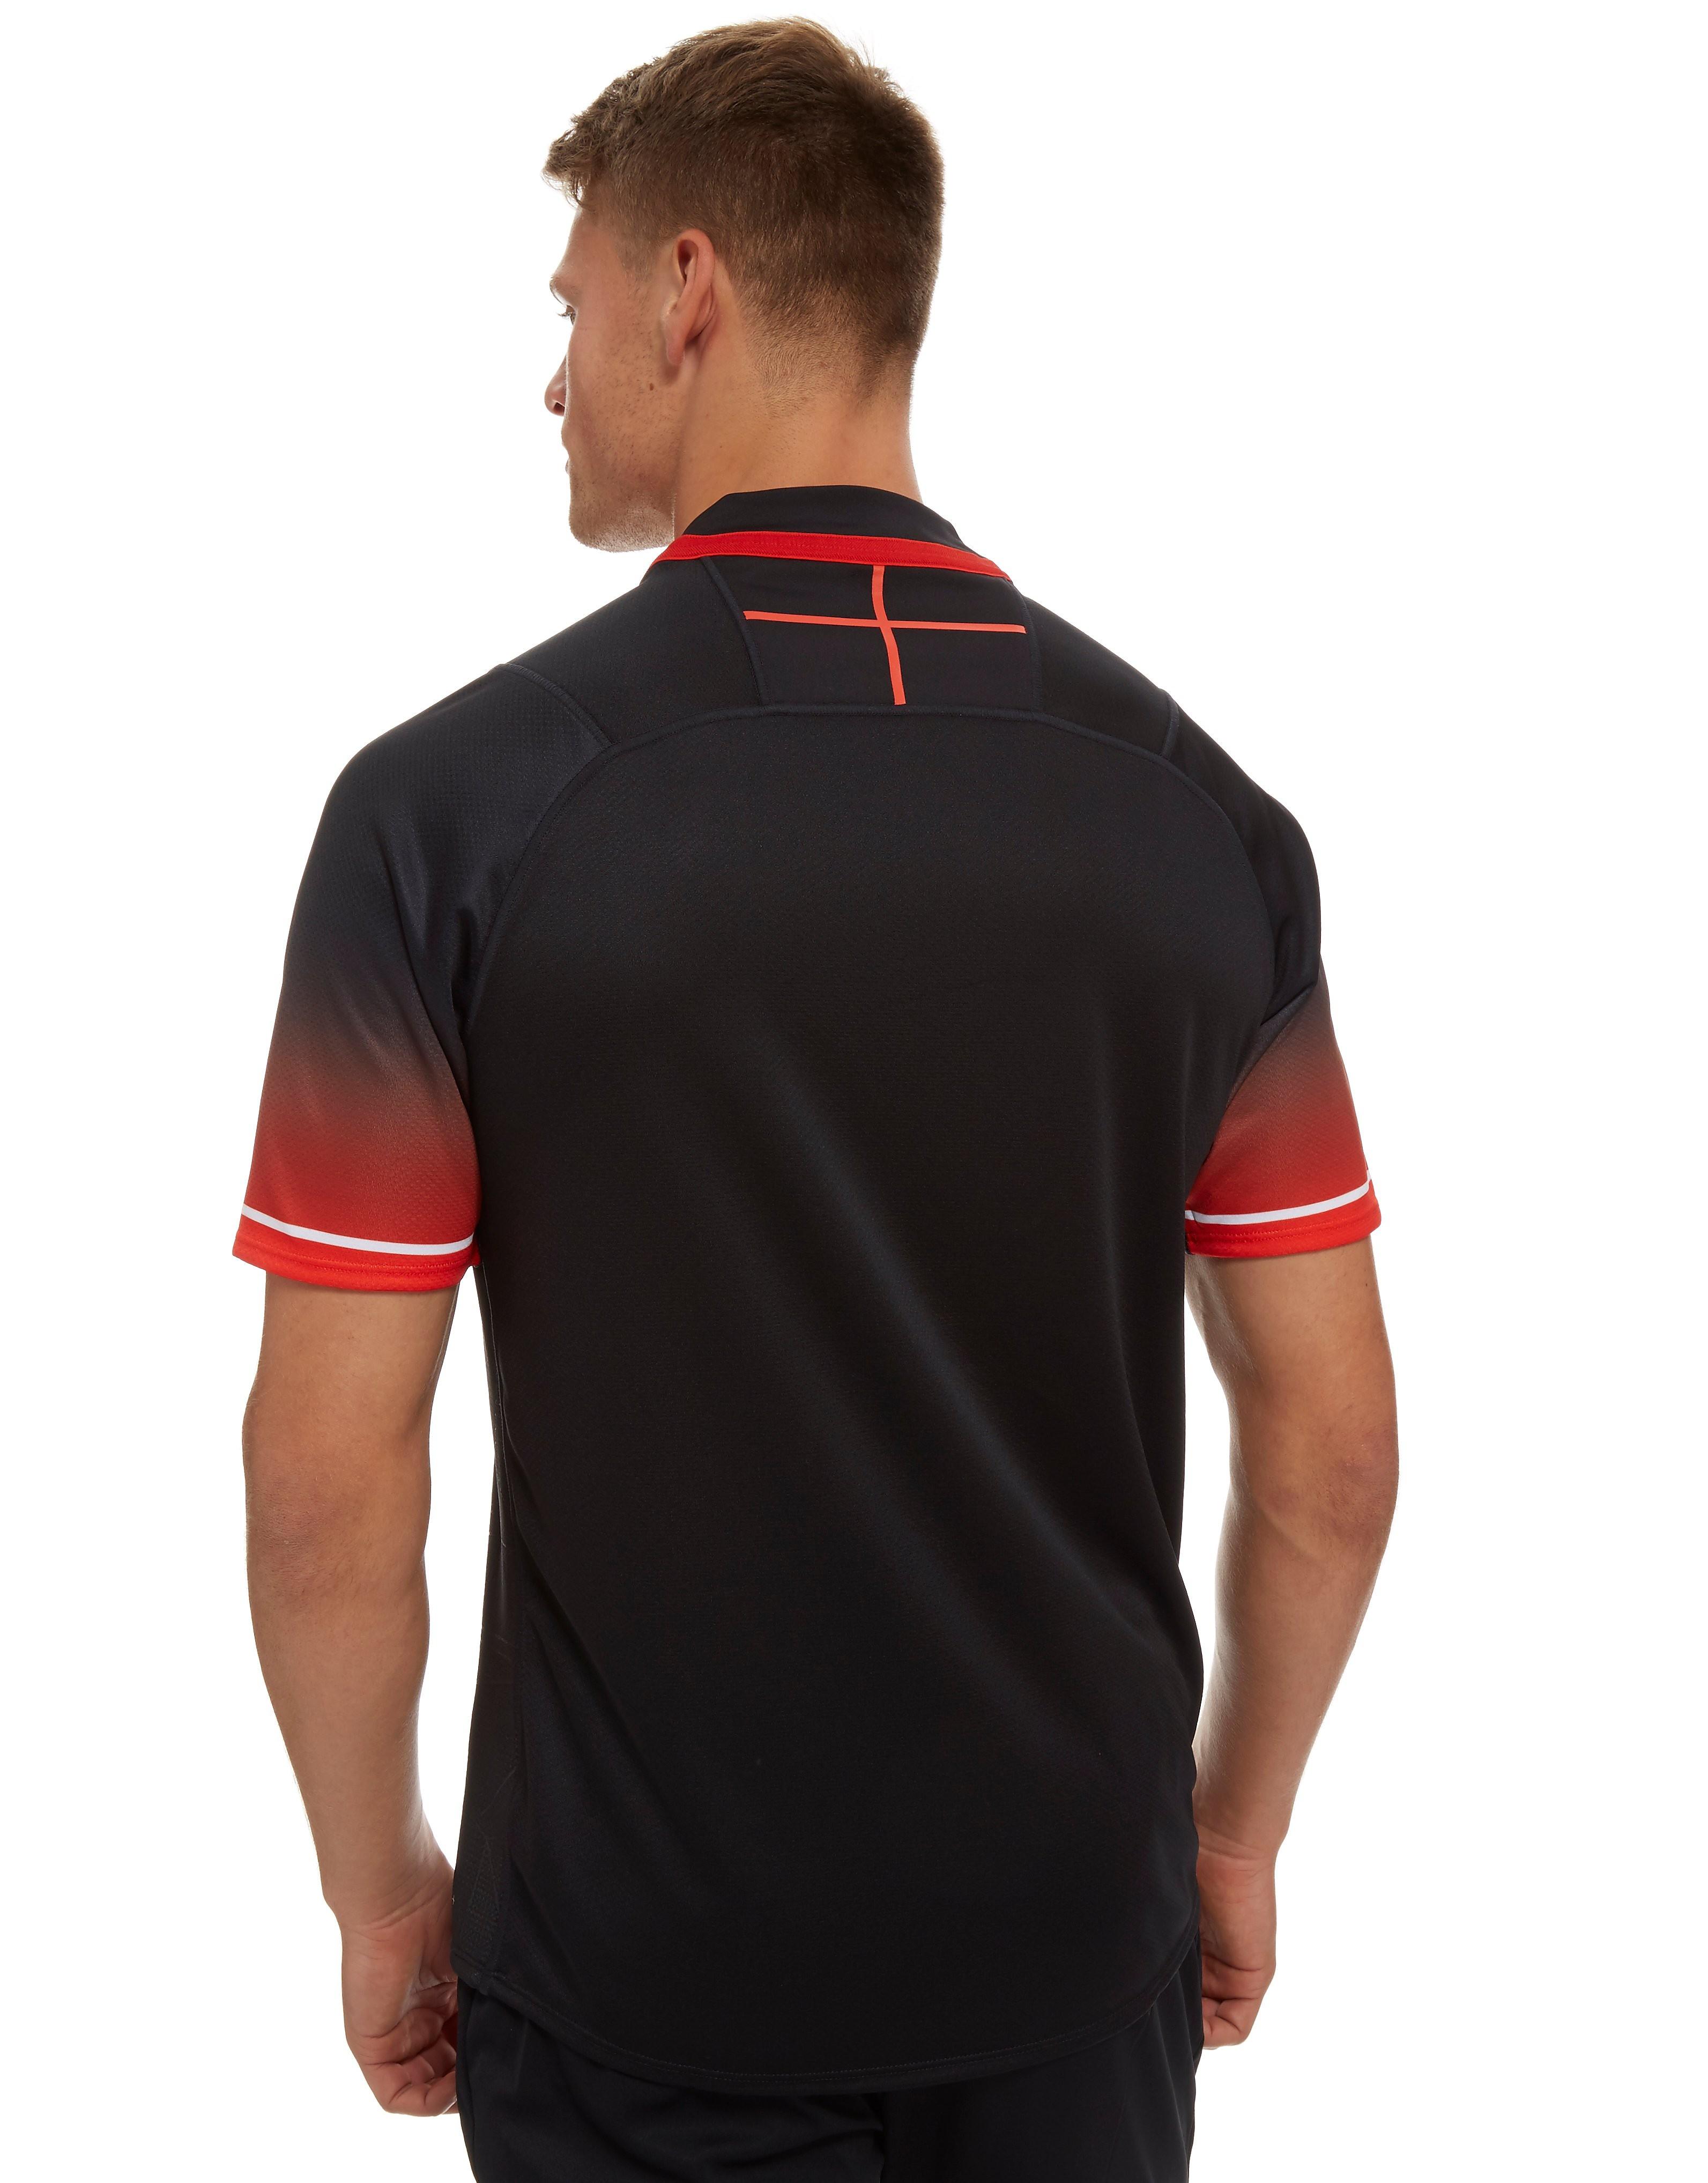 Canterbury England RFU Alternate 2017/18 Shirt